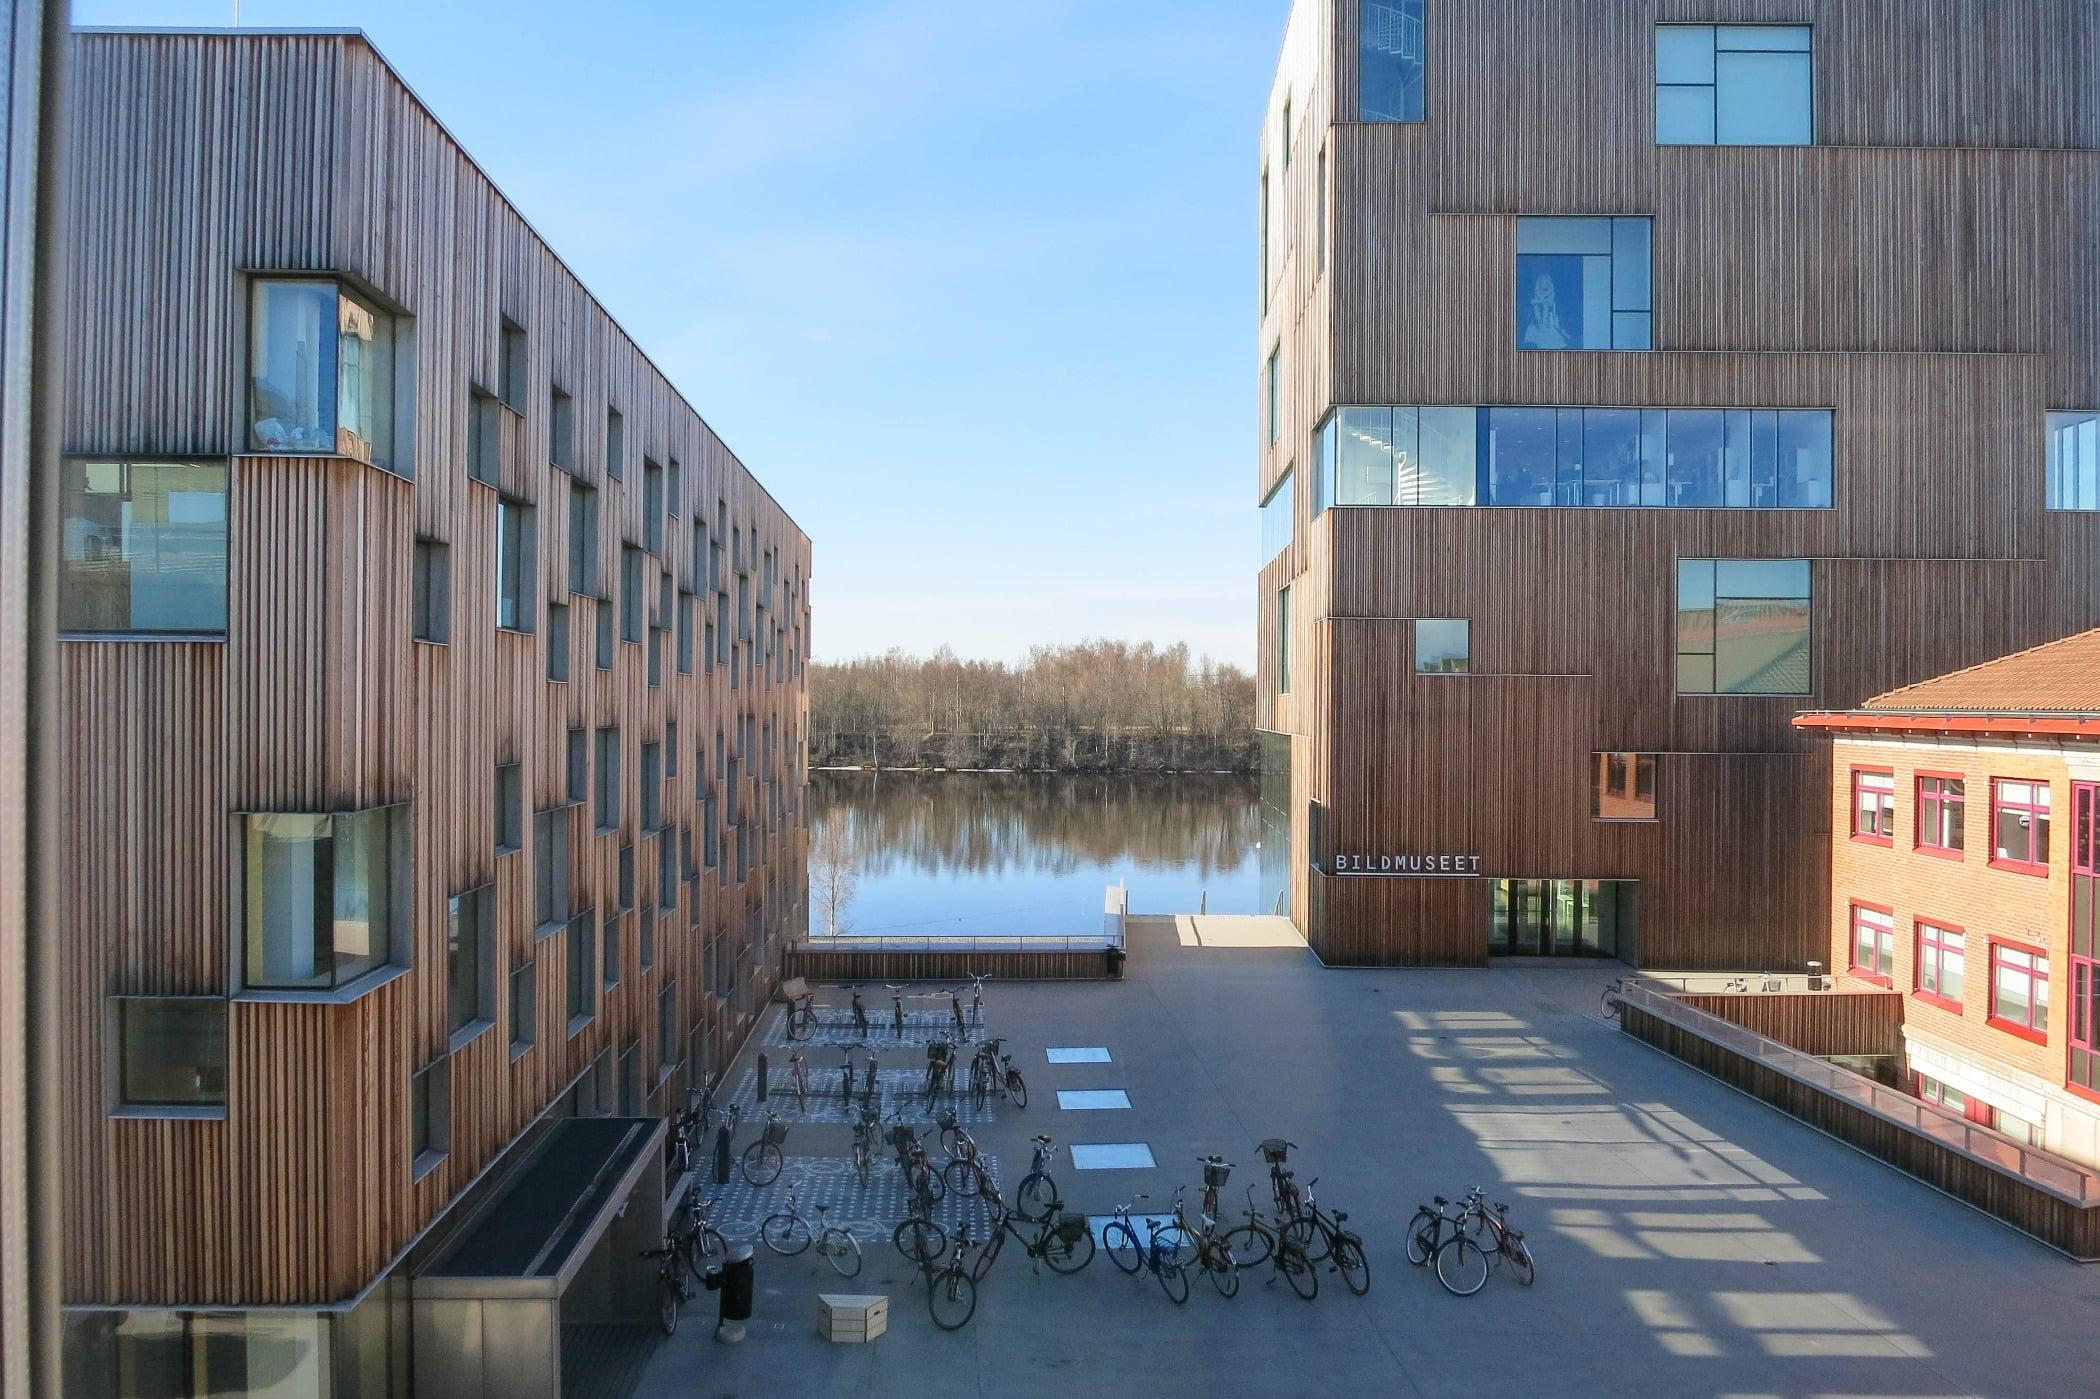 Urban design, Sky, Building, Window, Daytime, Water, Wood, Cloud, Lighting, Chair